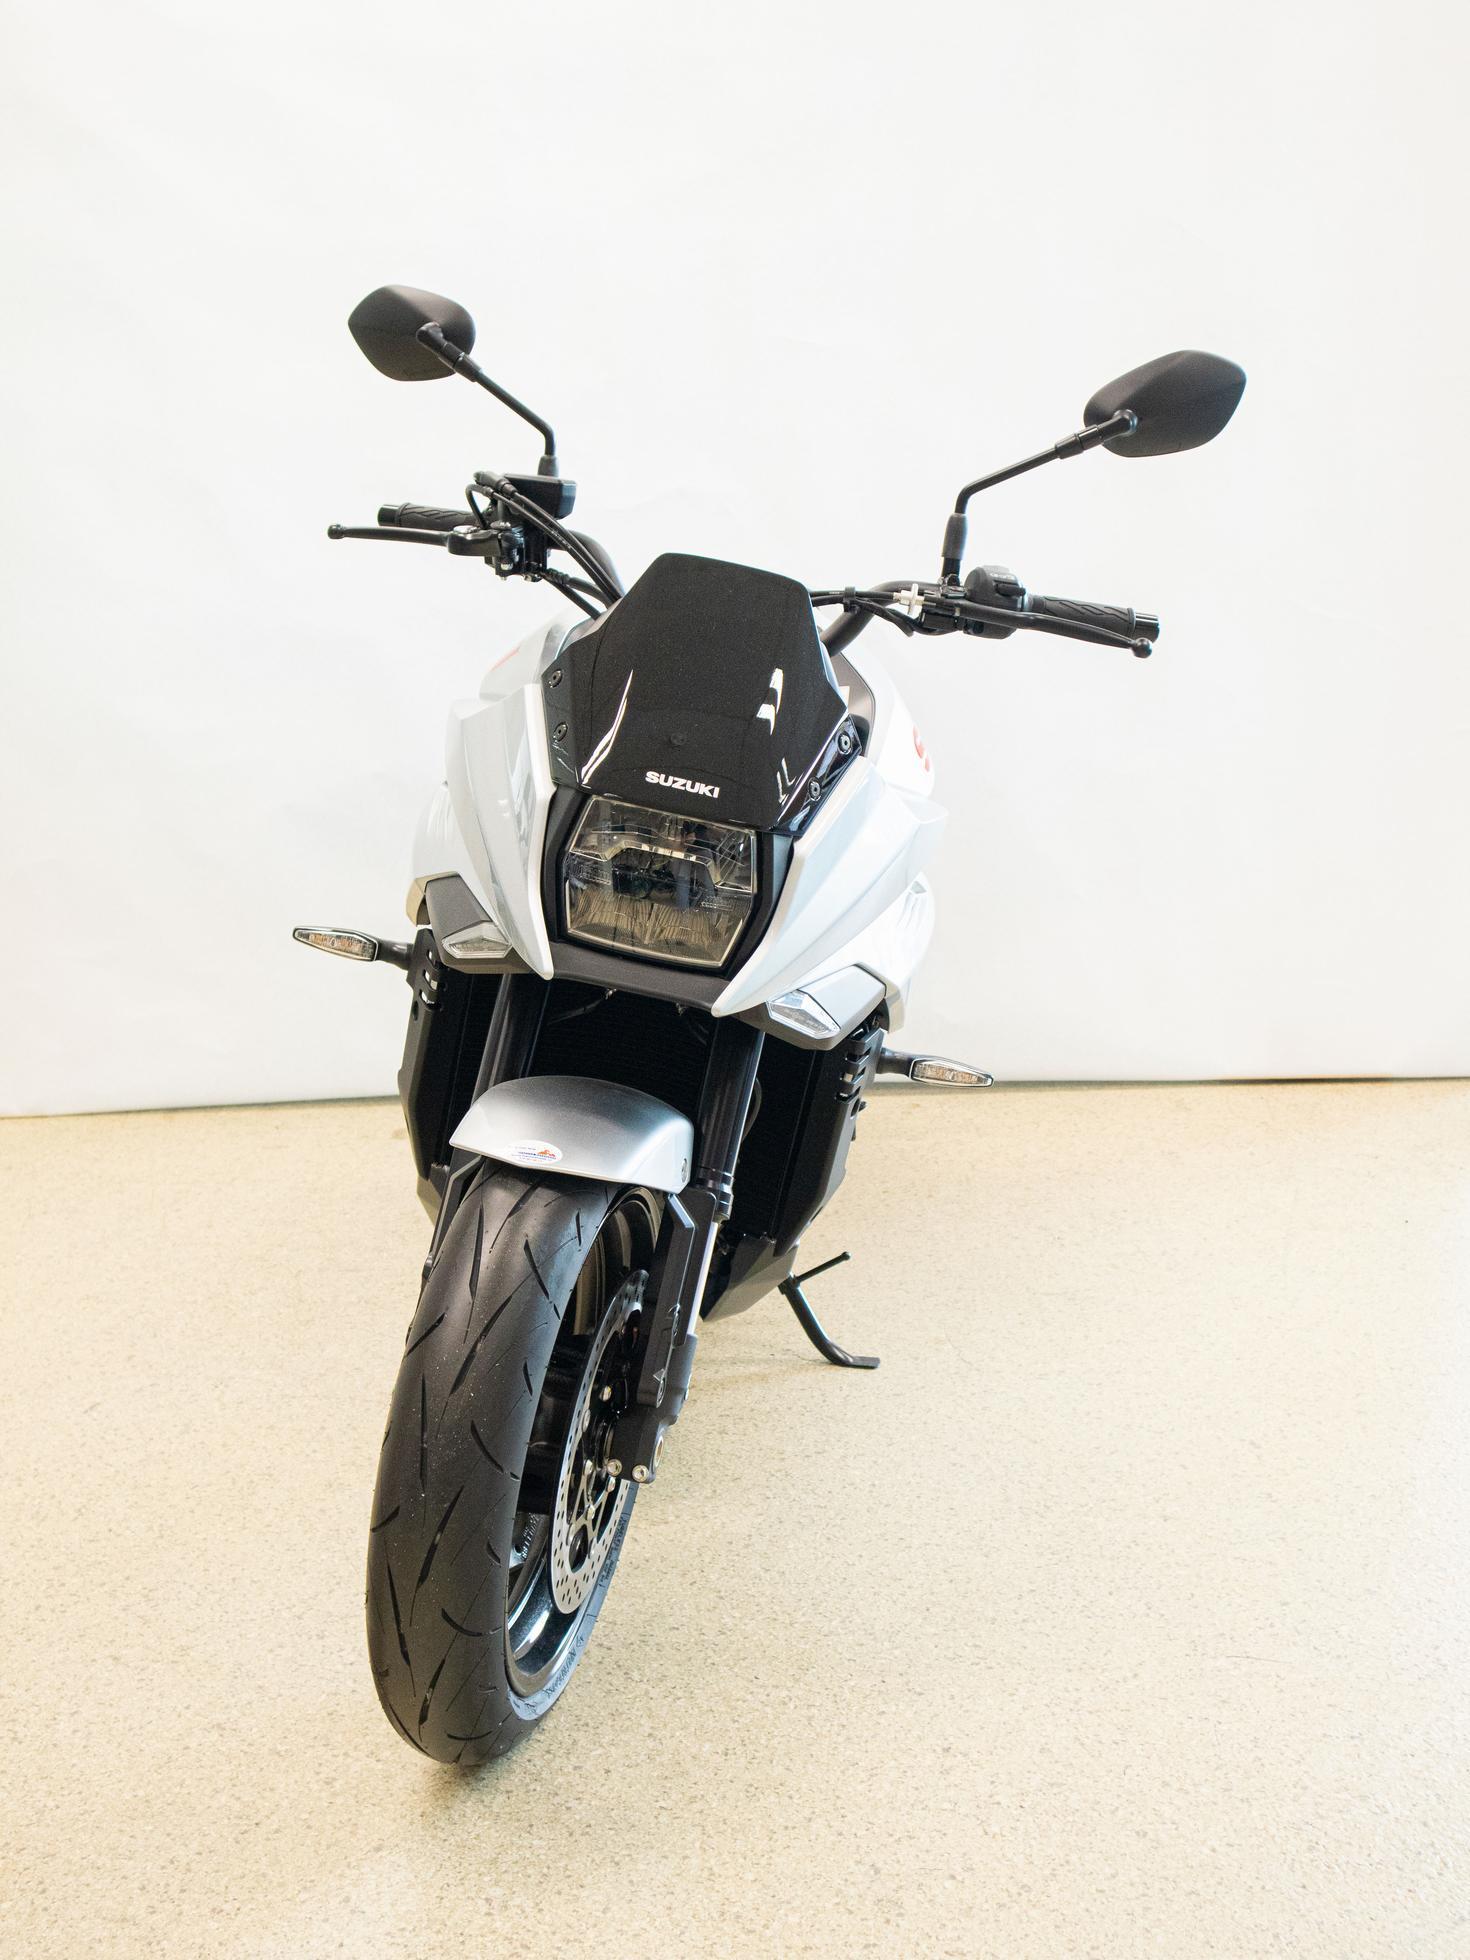 Te Koop: SUZUKI GSX-S1000S Katana - BikeNet